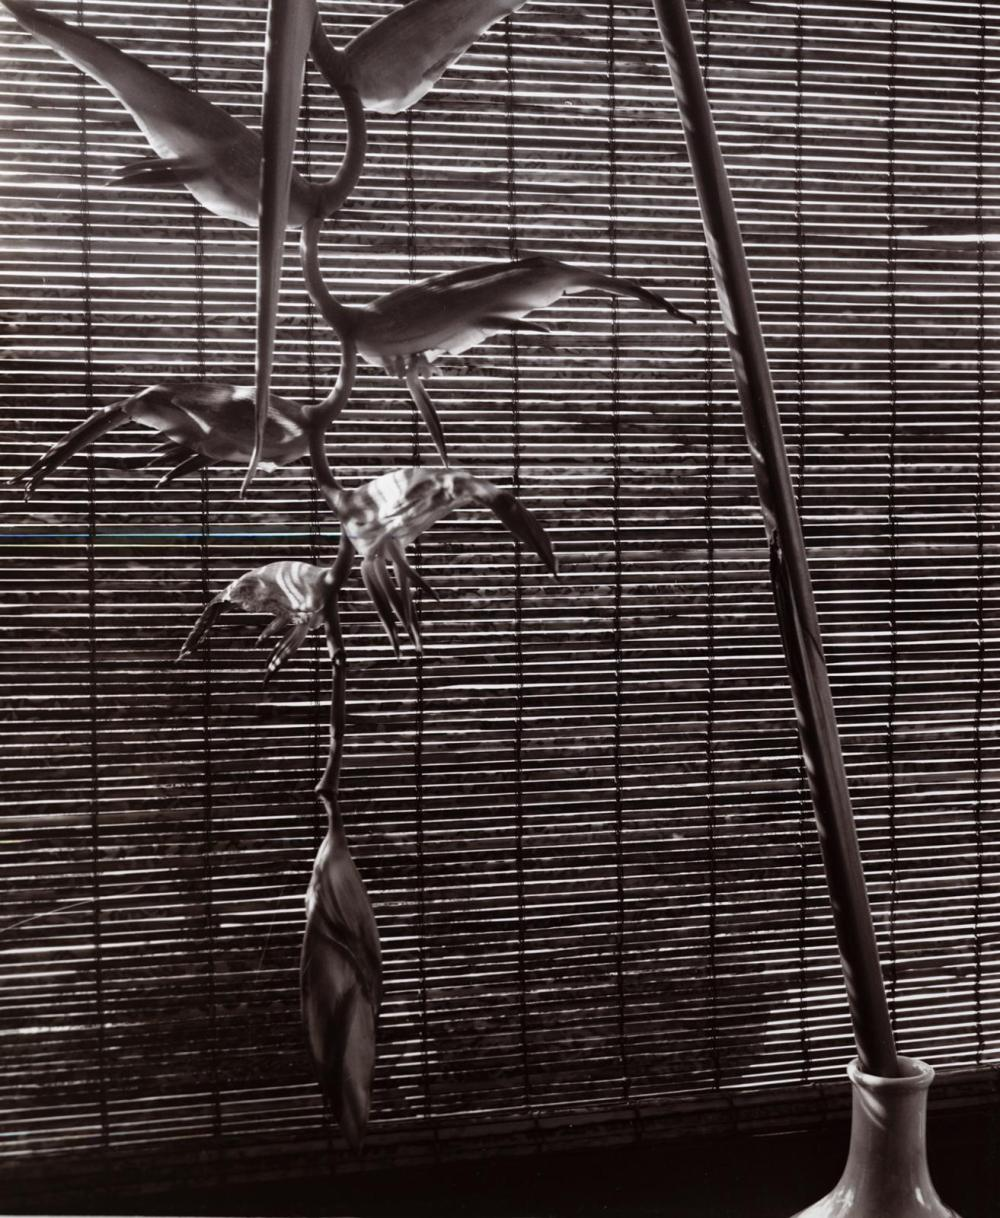 "SAM MAHL VINTAGE PHOTO "" BIRDS OF PARADISE: CIRCA 1964"